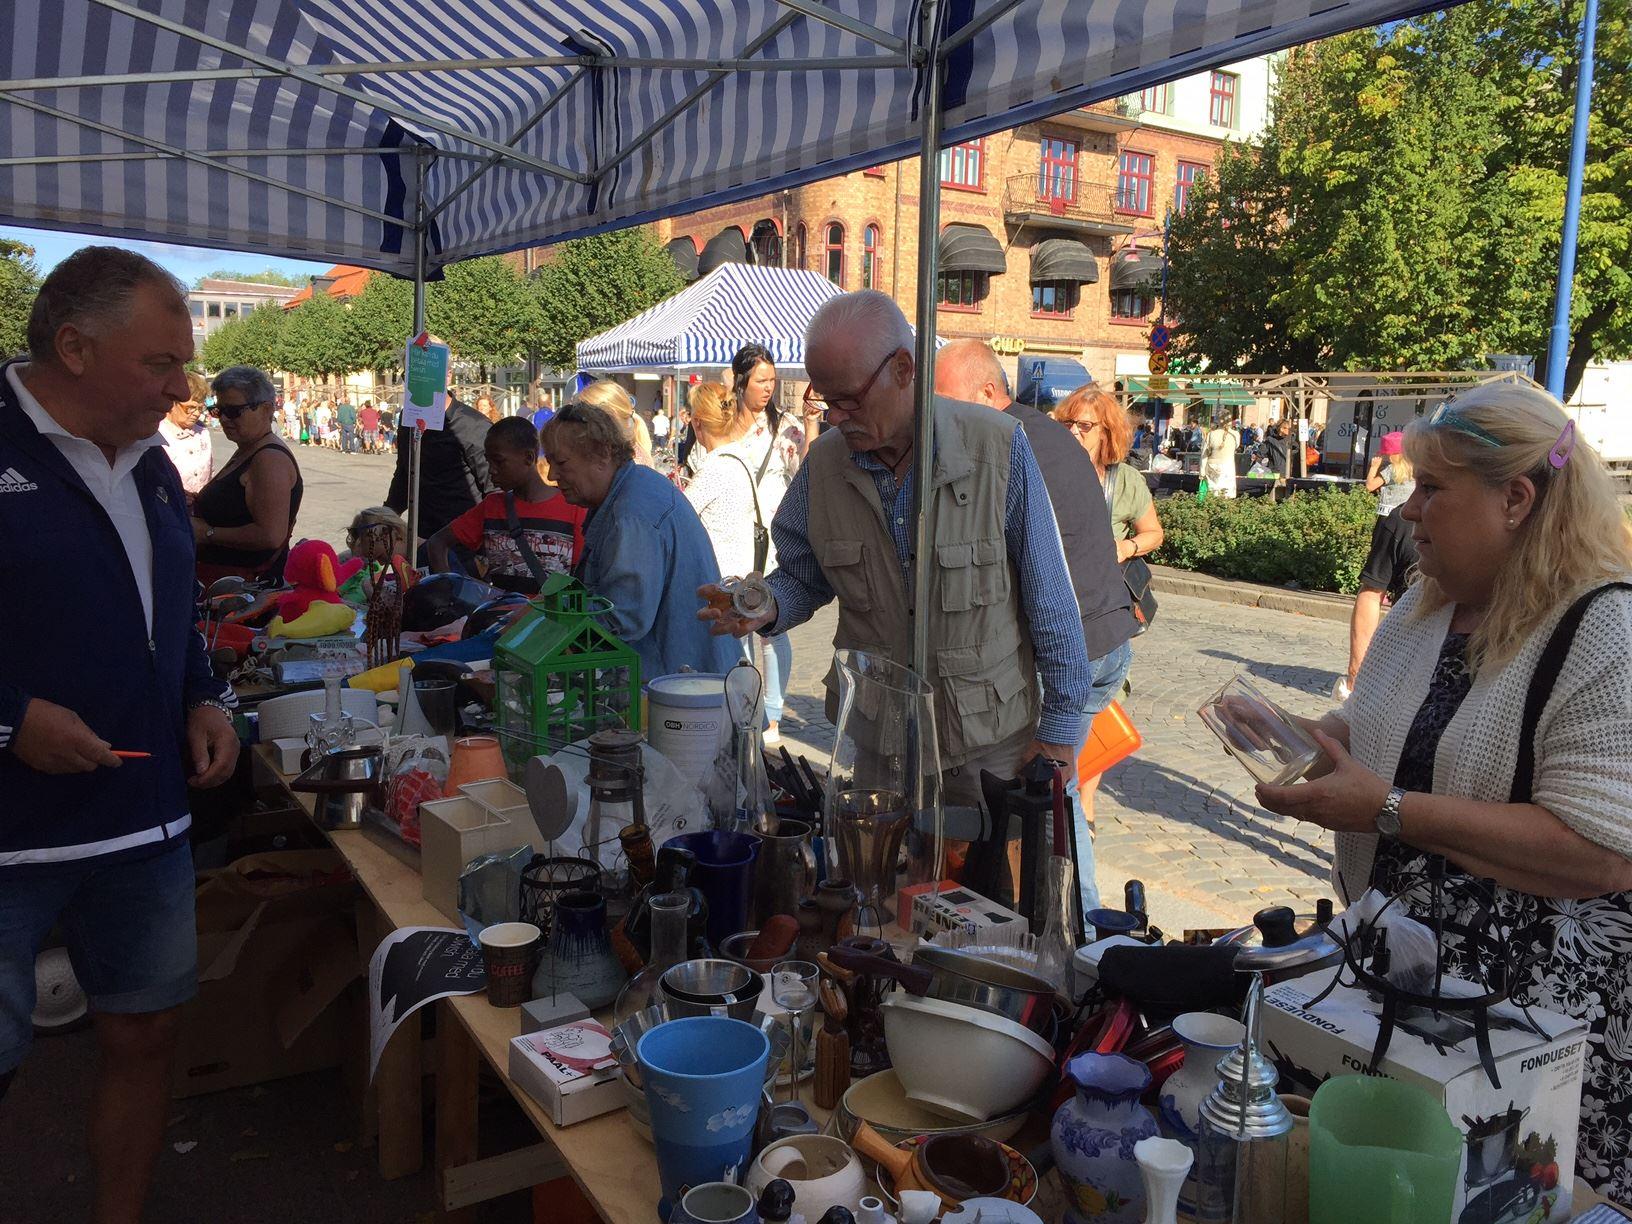 Flohmarkt in Vetlanda